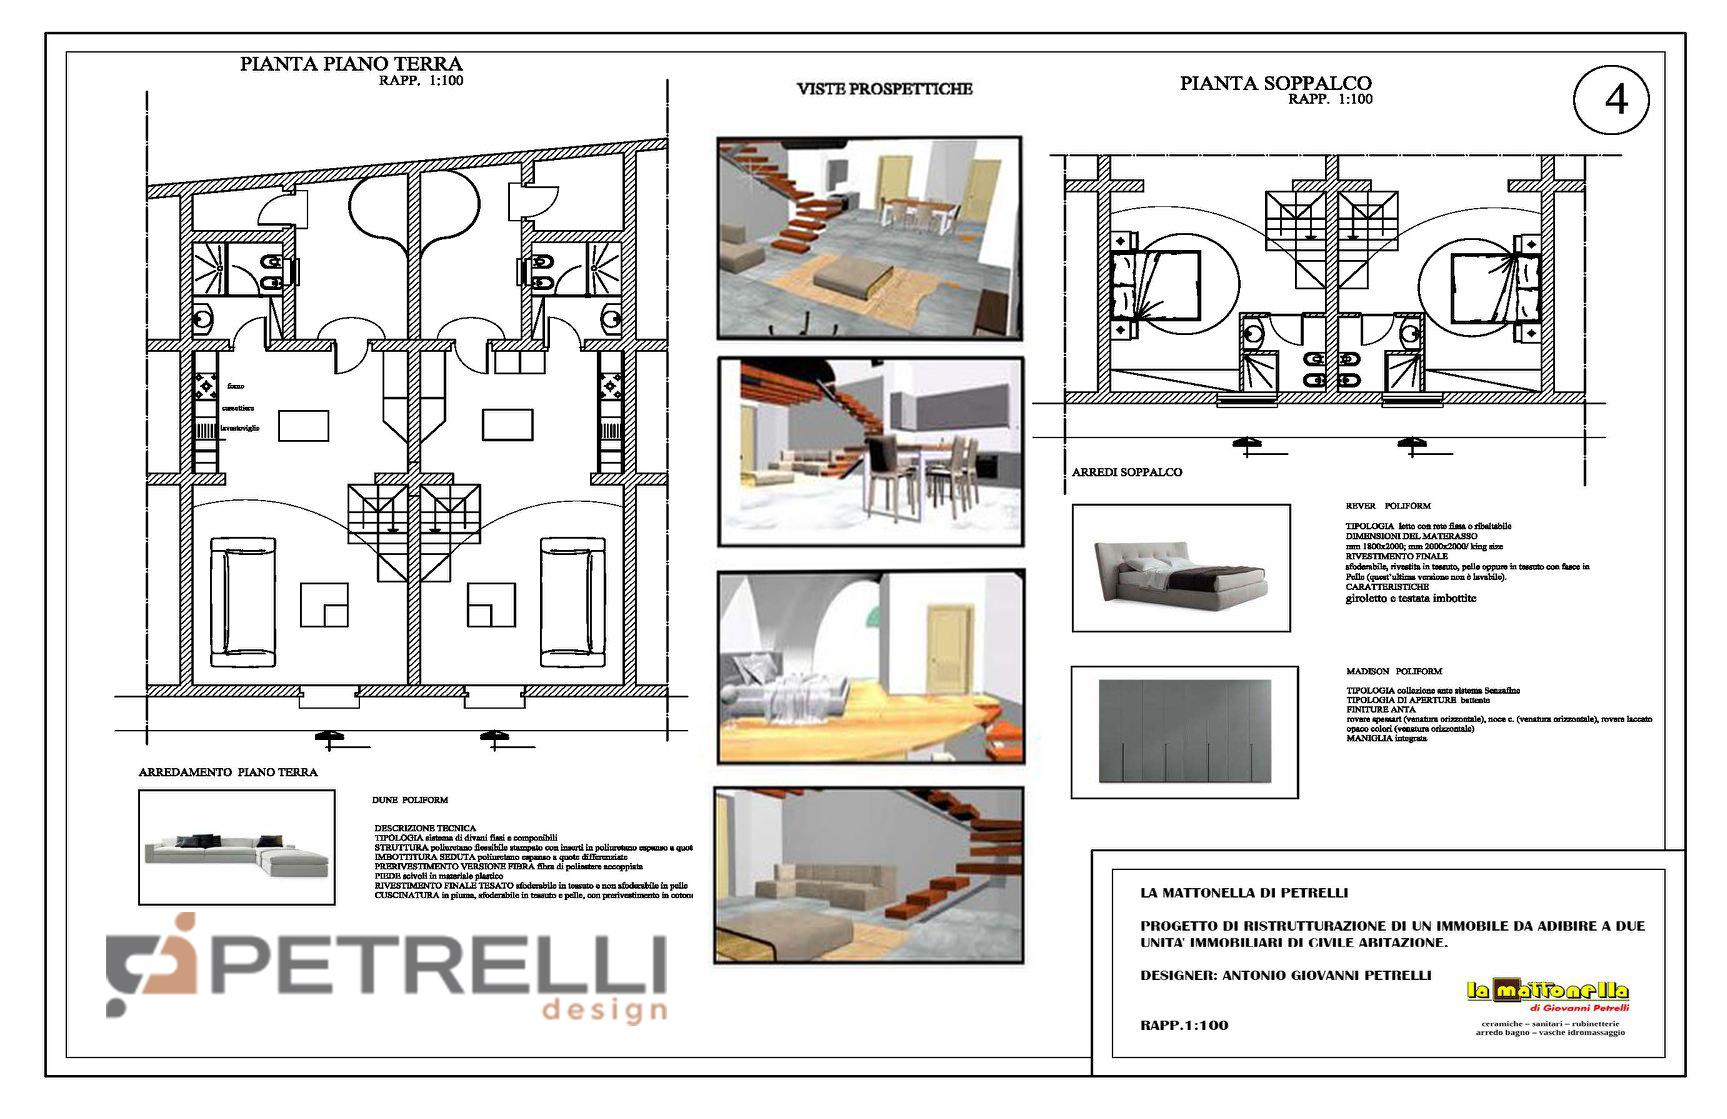 RistRutturatION 2 - Interior - 3 -PetrelliDesig